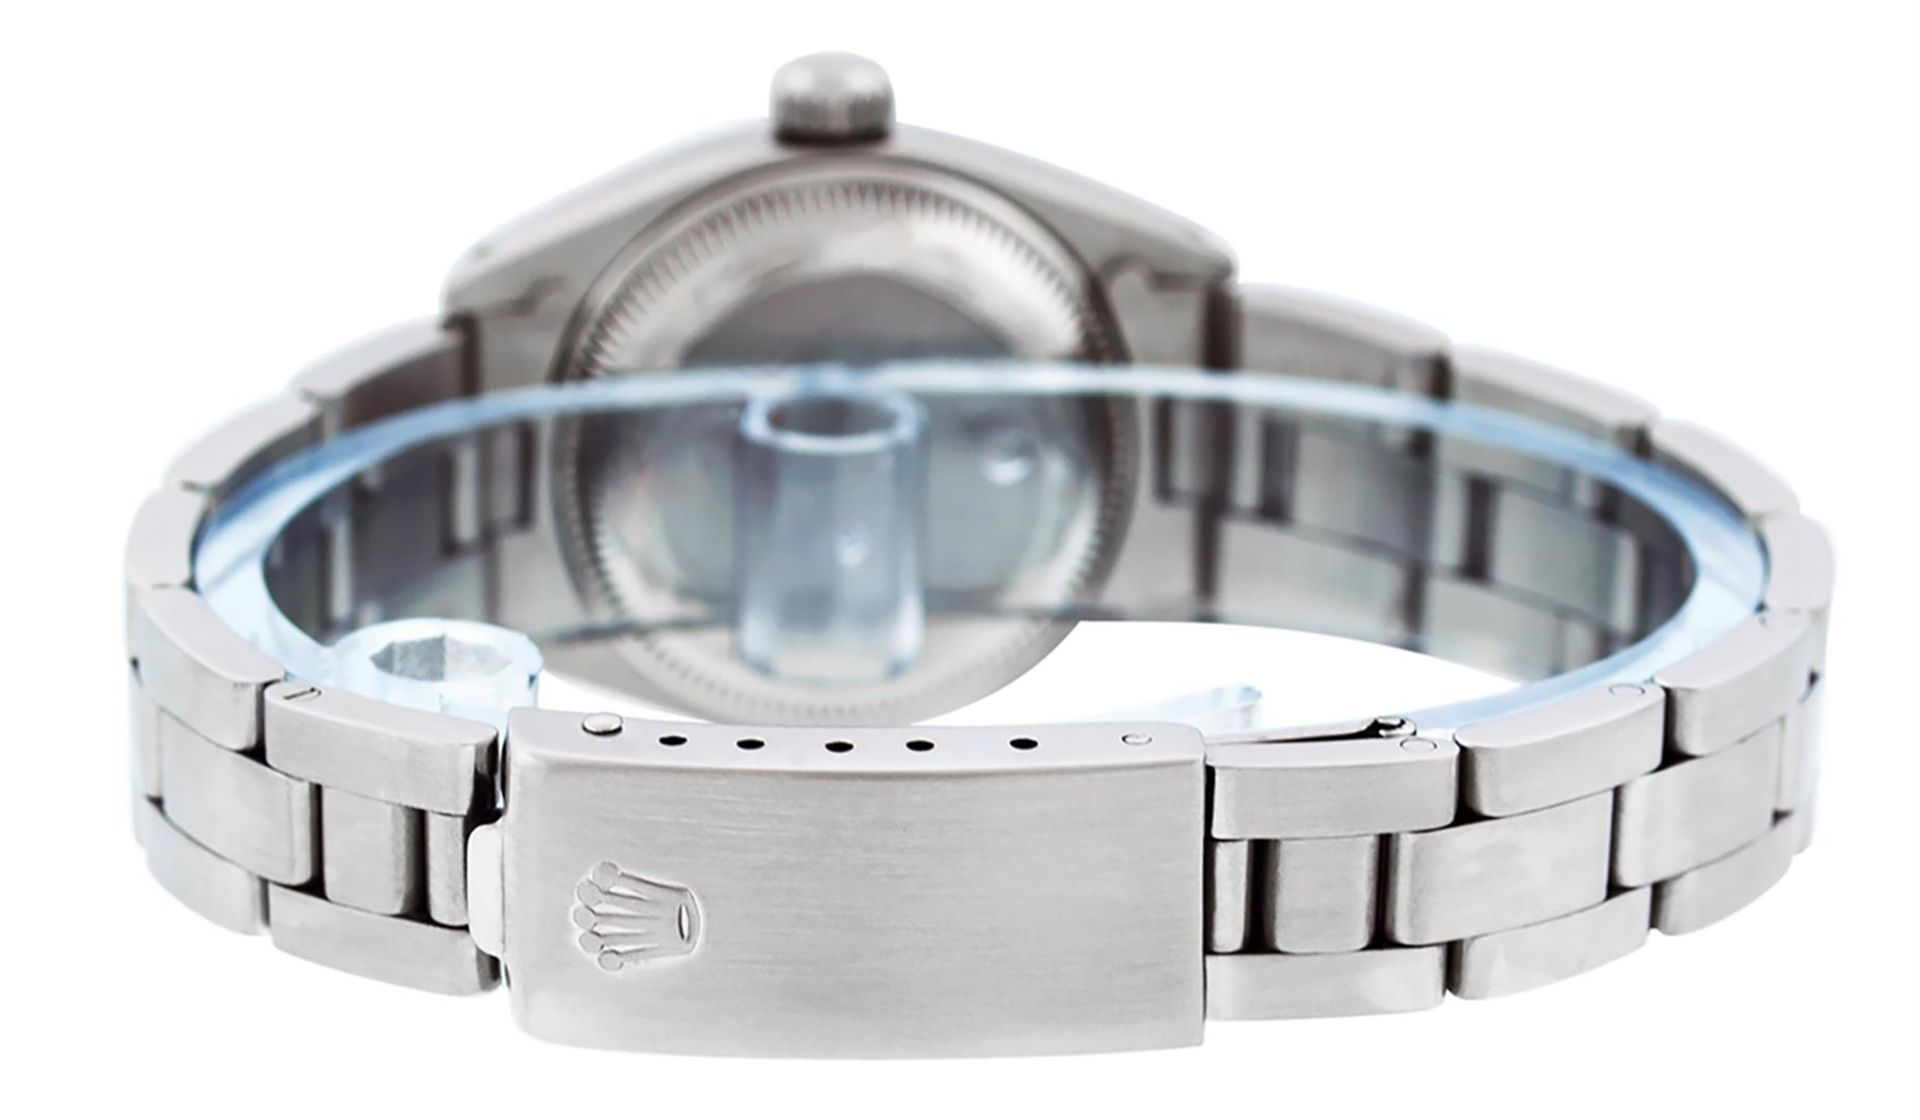 Rolex Ladies Stainless Steel MOP Emerald & Diamond Oyster Perpetaul Datejust Wri - Image 7 of 9